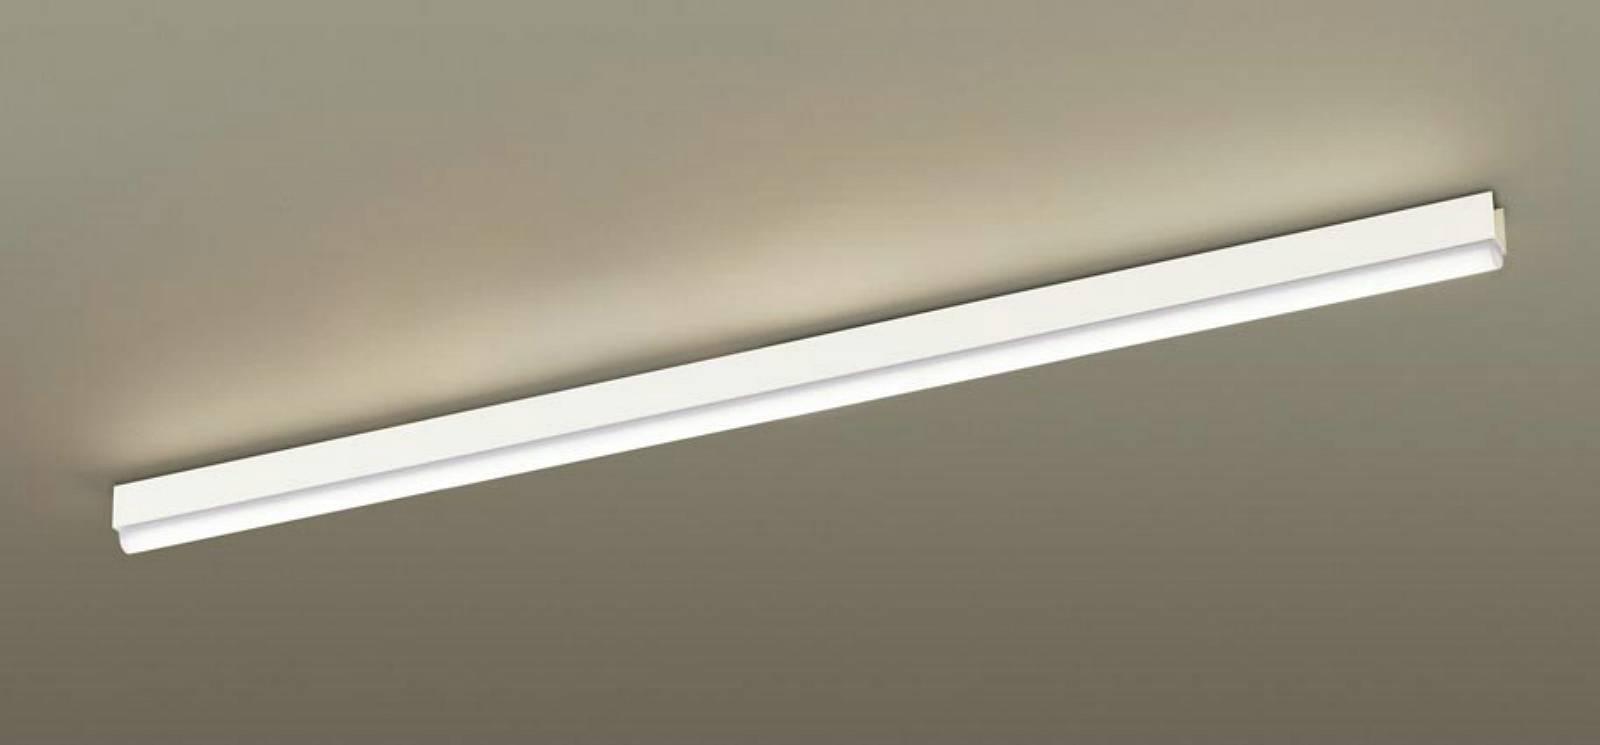 T区分 パナソニック LGB50610LB1 ベースライト 建築化照明器具 畳数設定無し LED【setsuden_led】